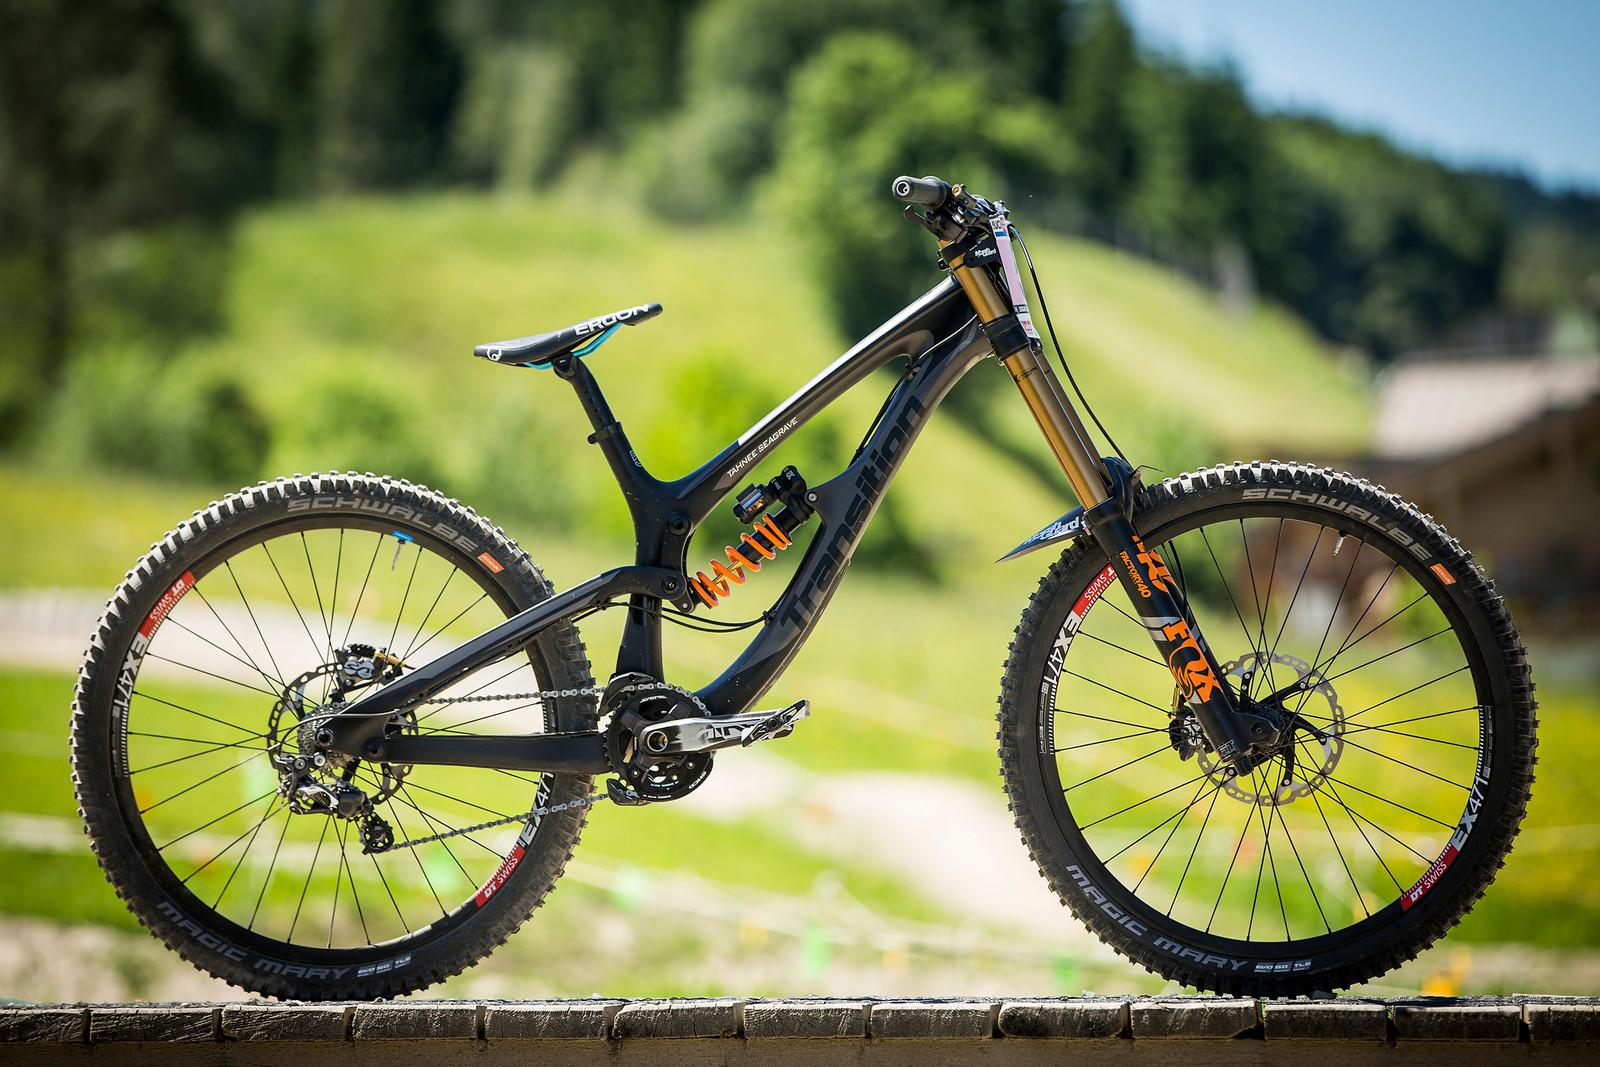 WINNING BIKE: Tahnee Seagrave's Prototype Transition - WINNING BIKE: Tahnee Seagrave's Prototype Transition - Mountain Biking Pictures - Vital MTB